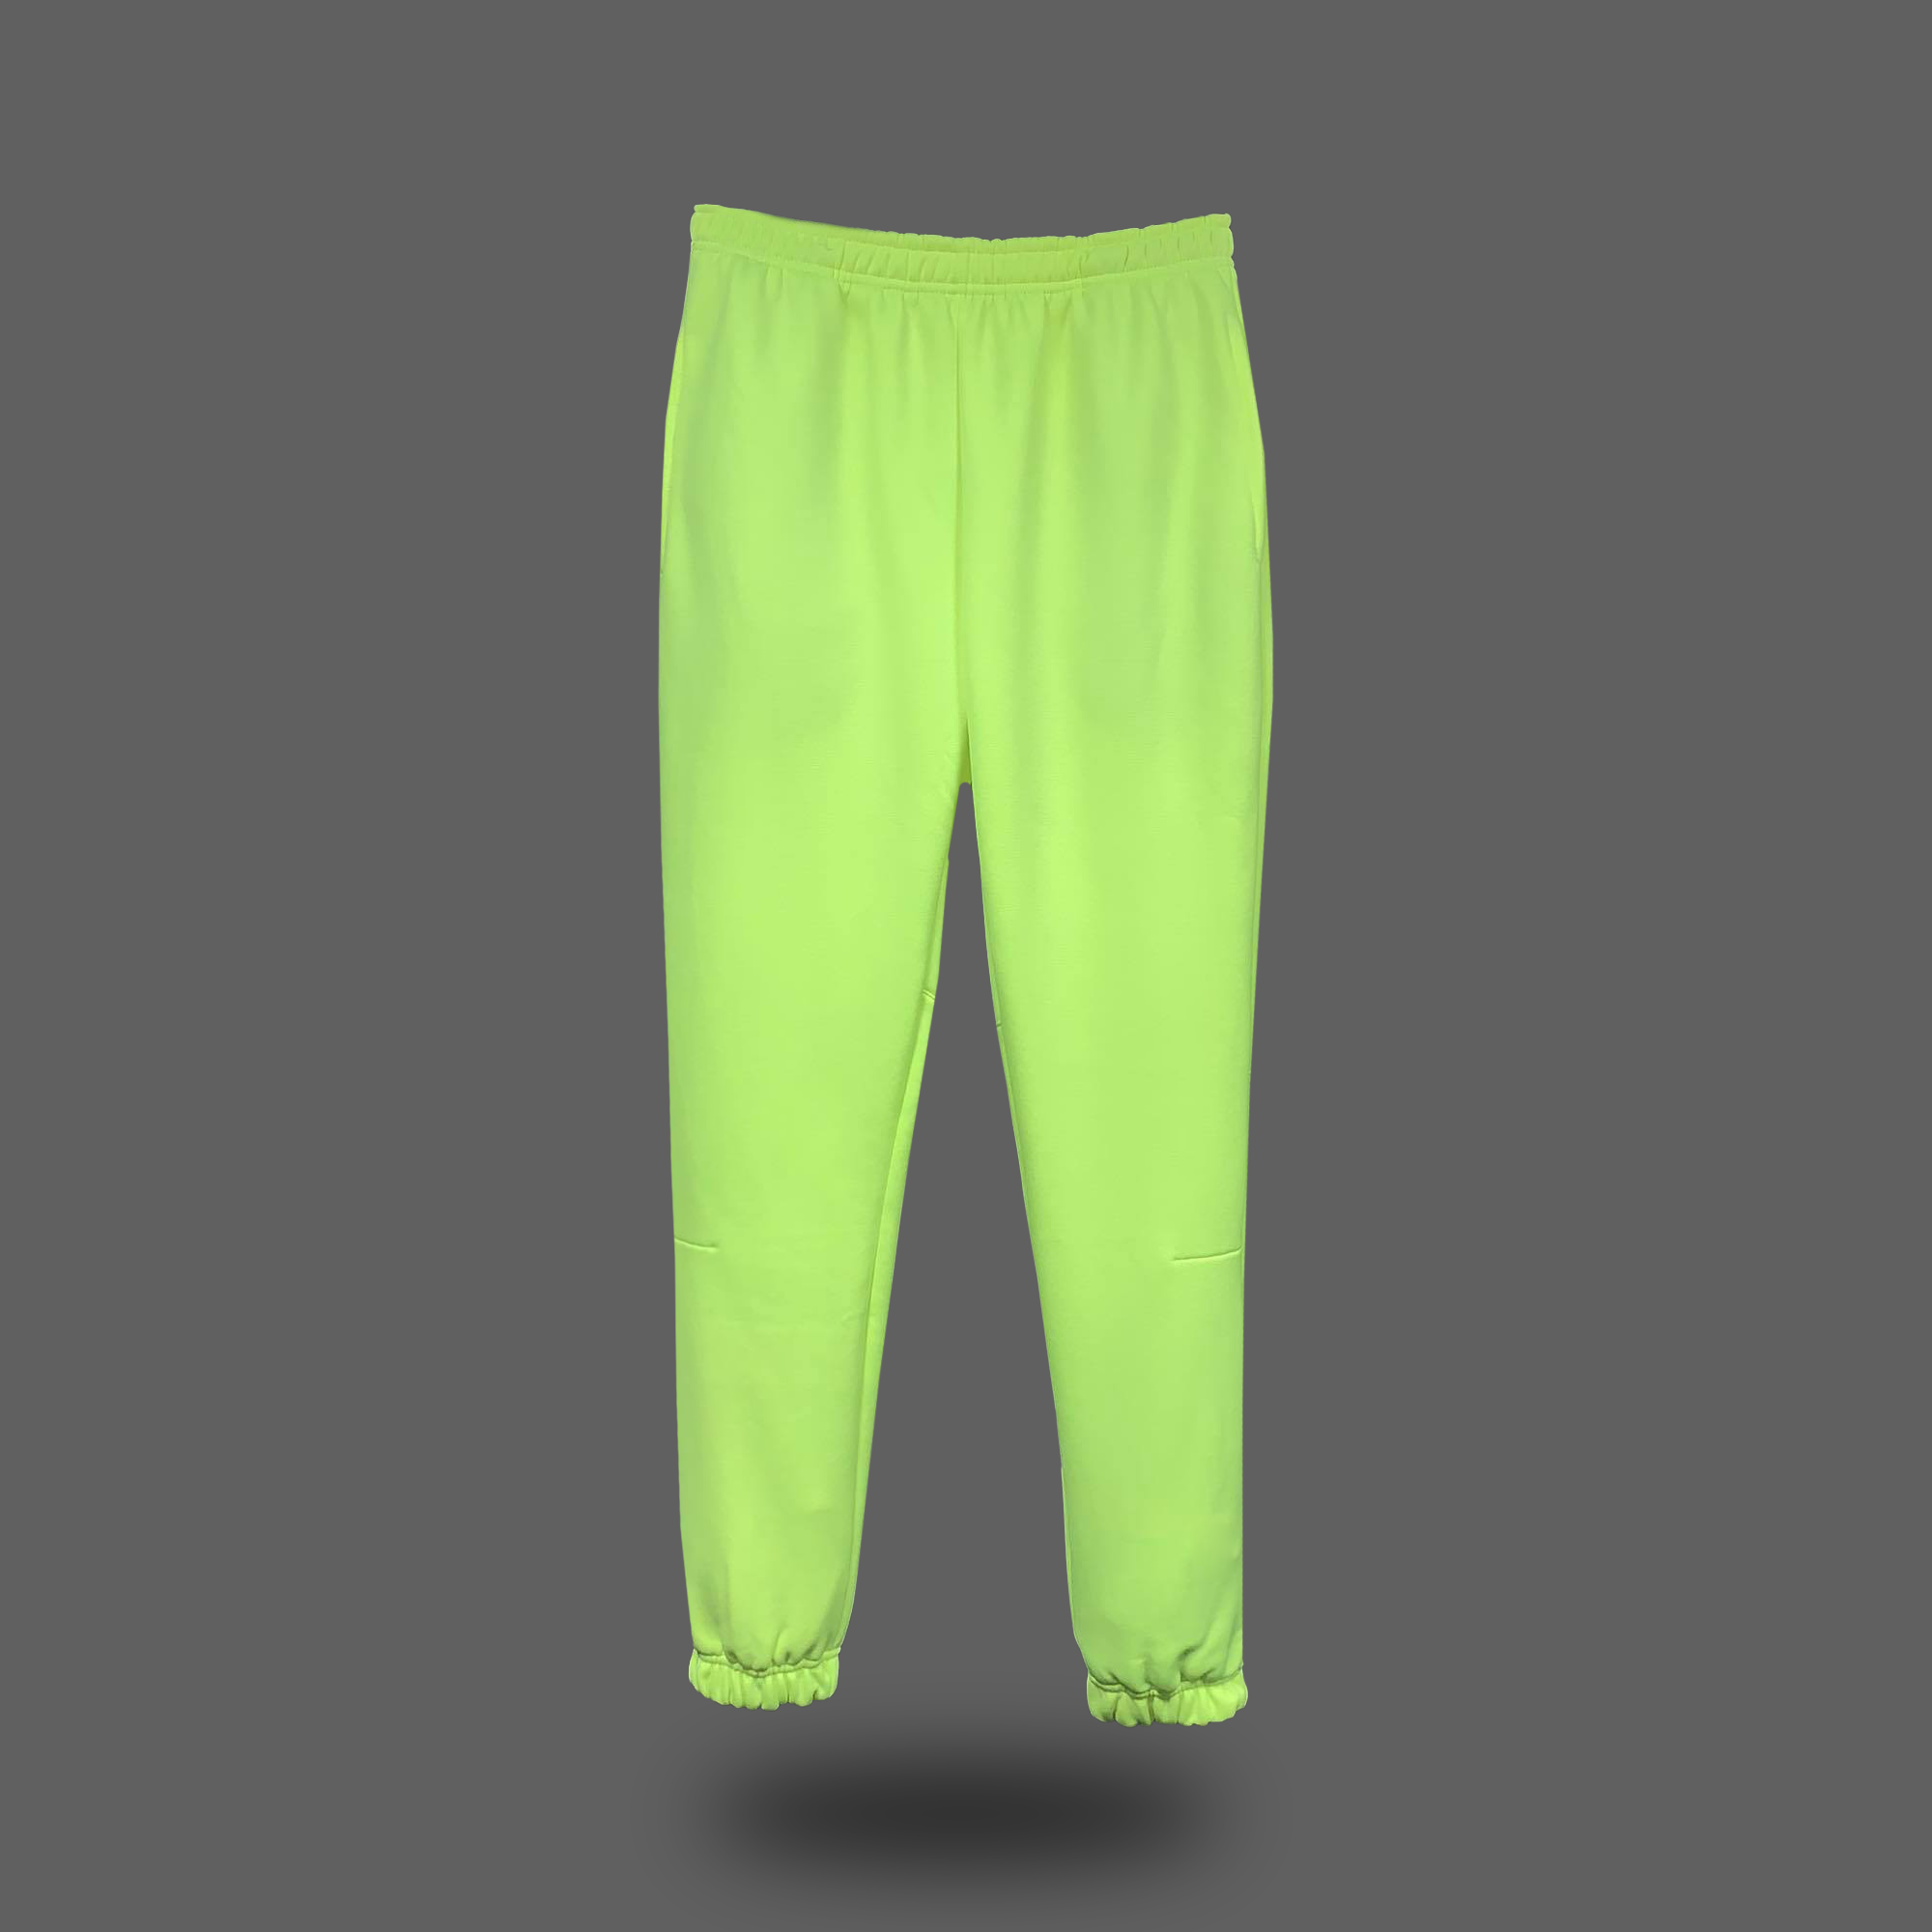 PLAIN SWEATPANTS - Neon Yellow